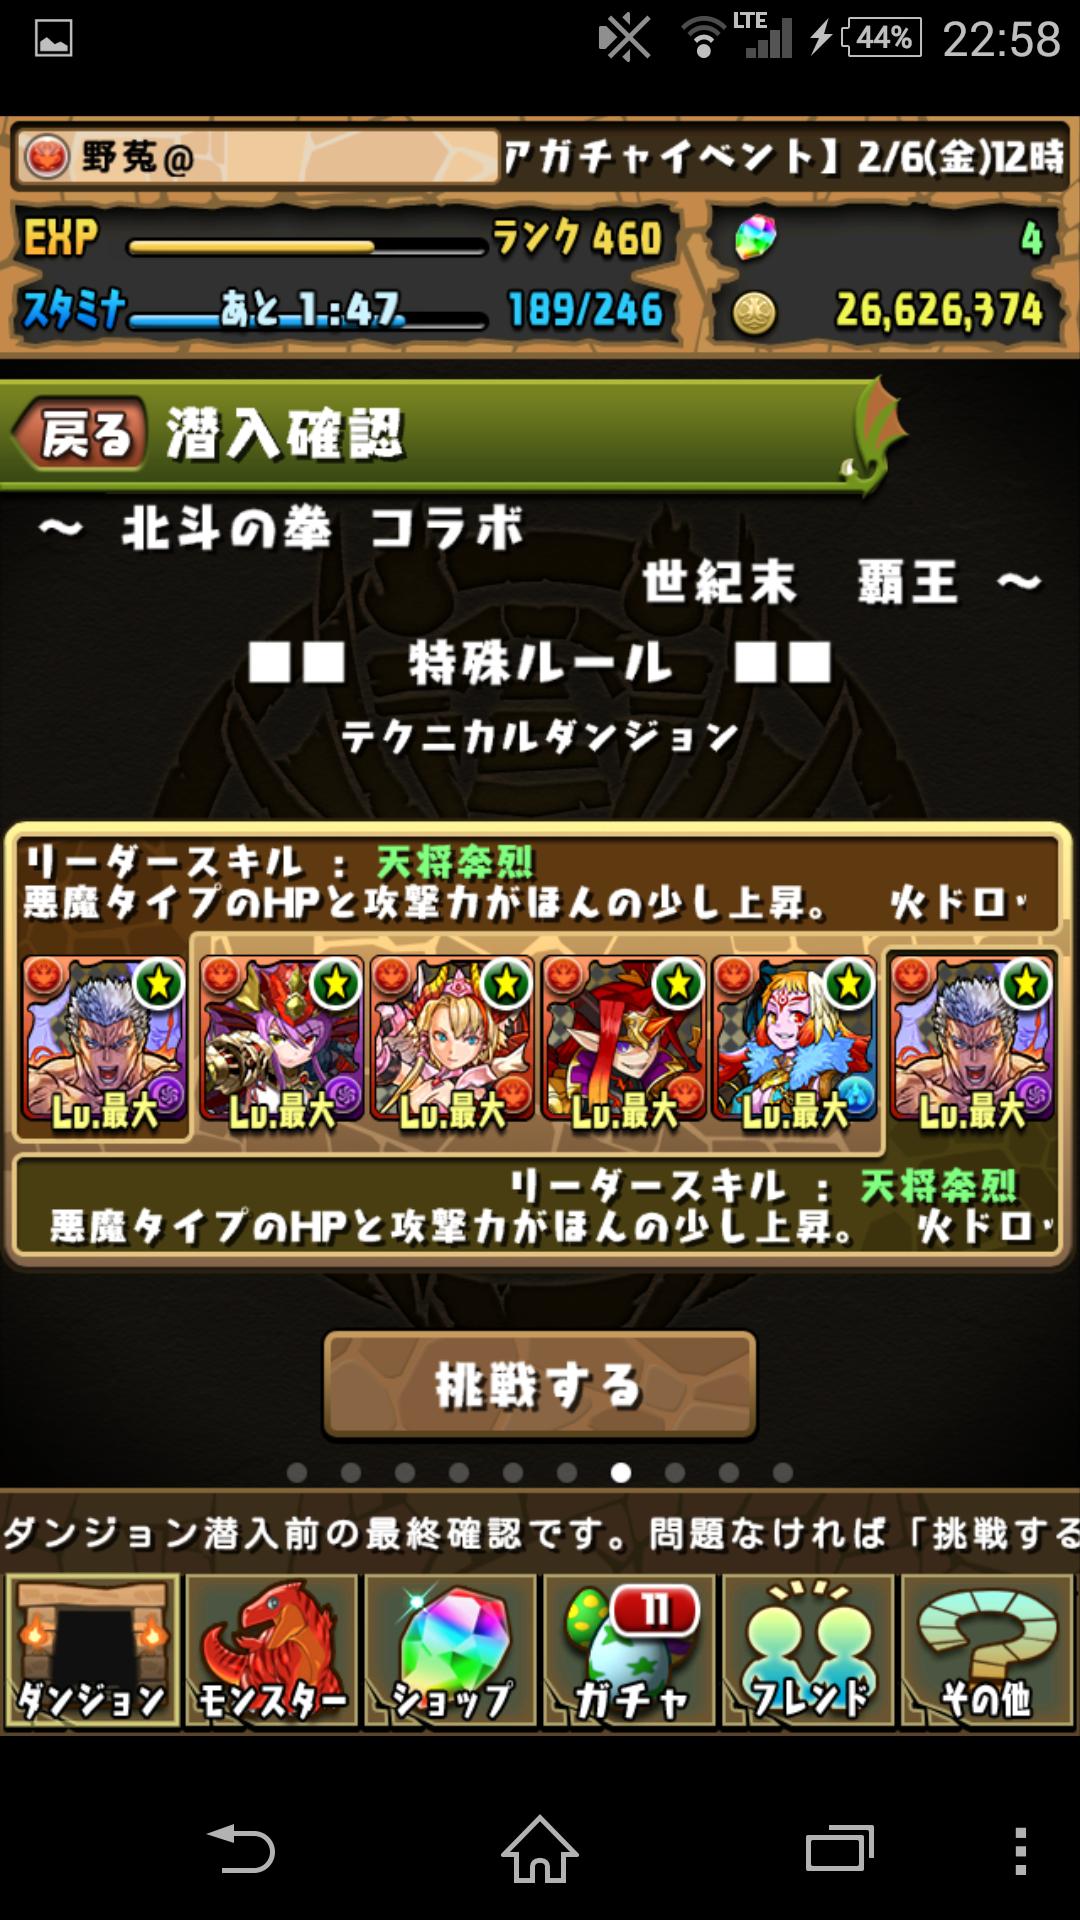 Screenshot_2015-02-07-22-58-05.png